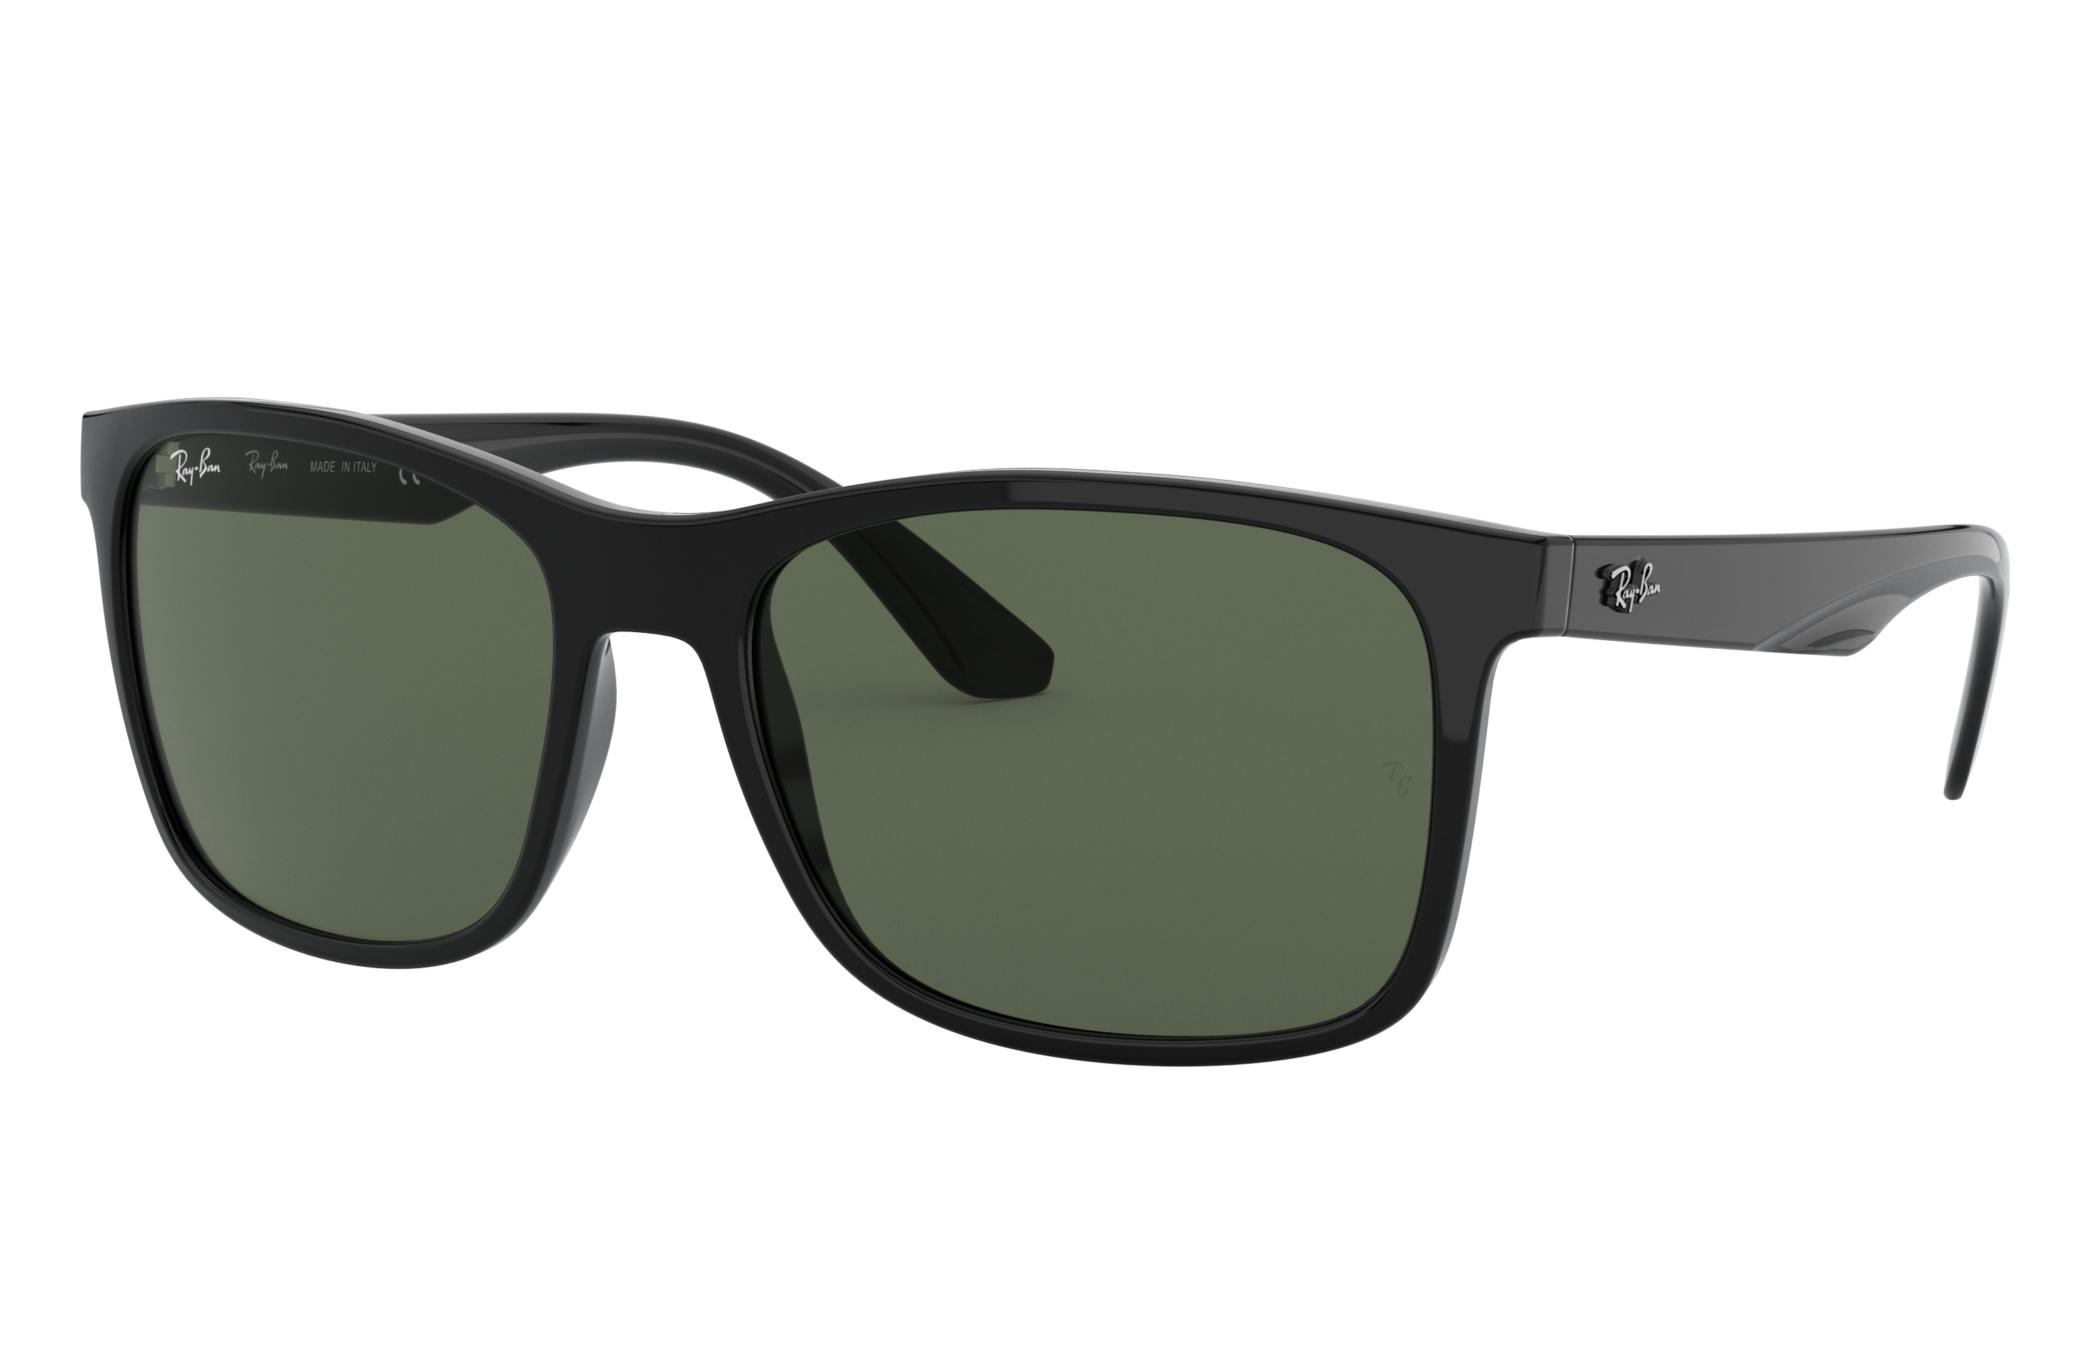 Ray-Ban Rb4232 Black, Green Lenses - RB4232